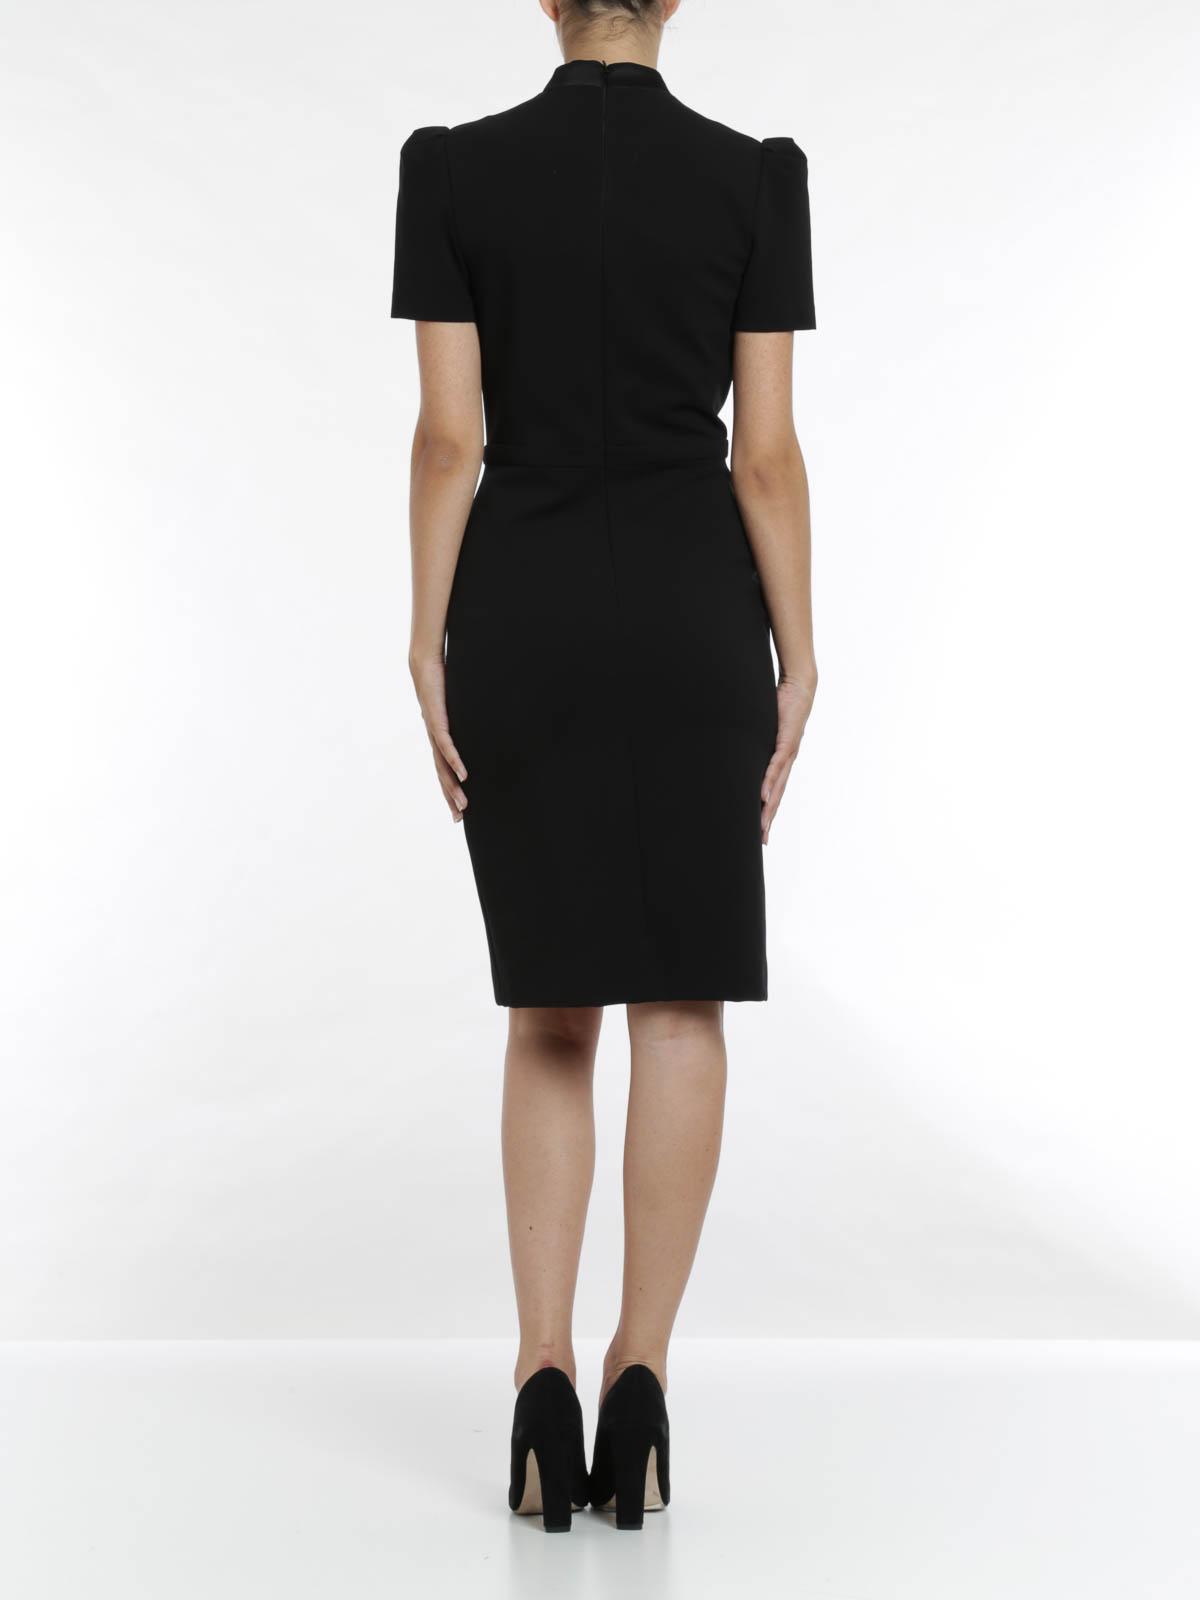 Cap sleeve black sequins mandarin collar traditional ...   Mandarin Collar Cocktail Dress